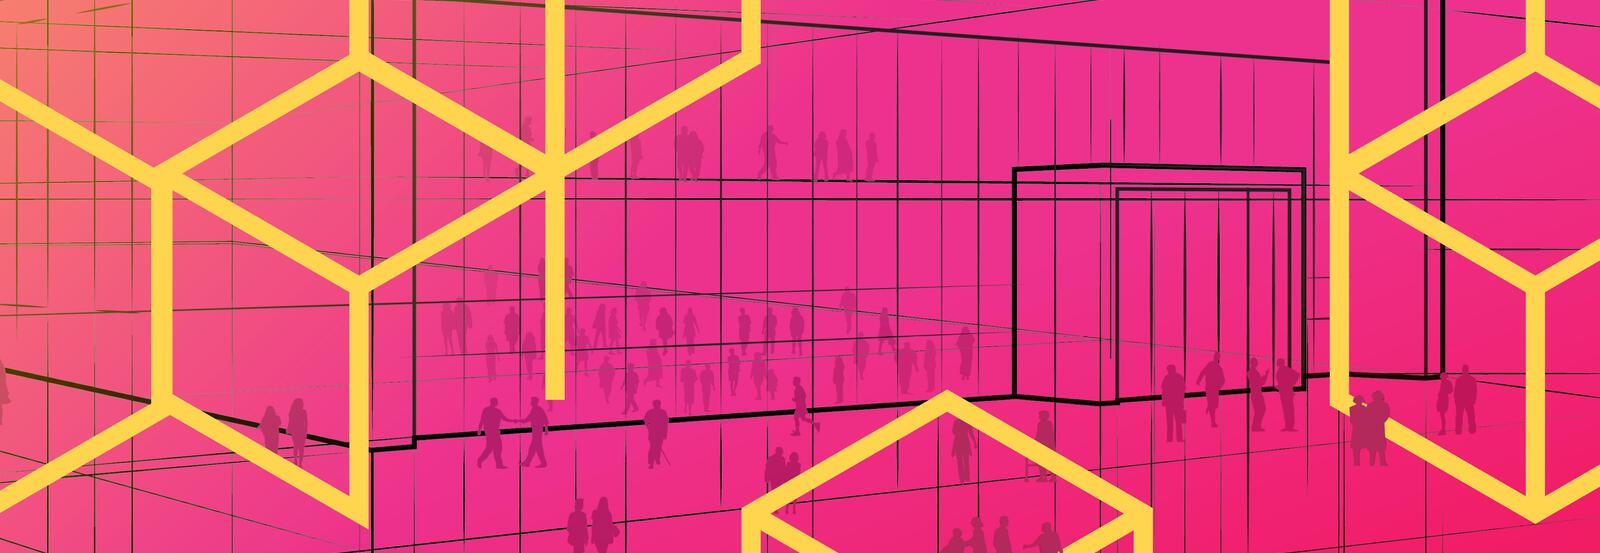 pink innovation arena